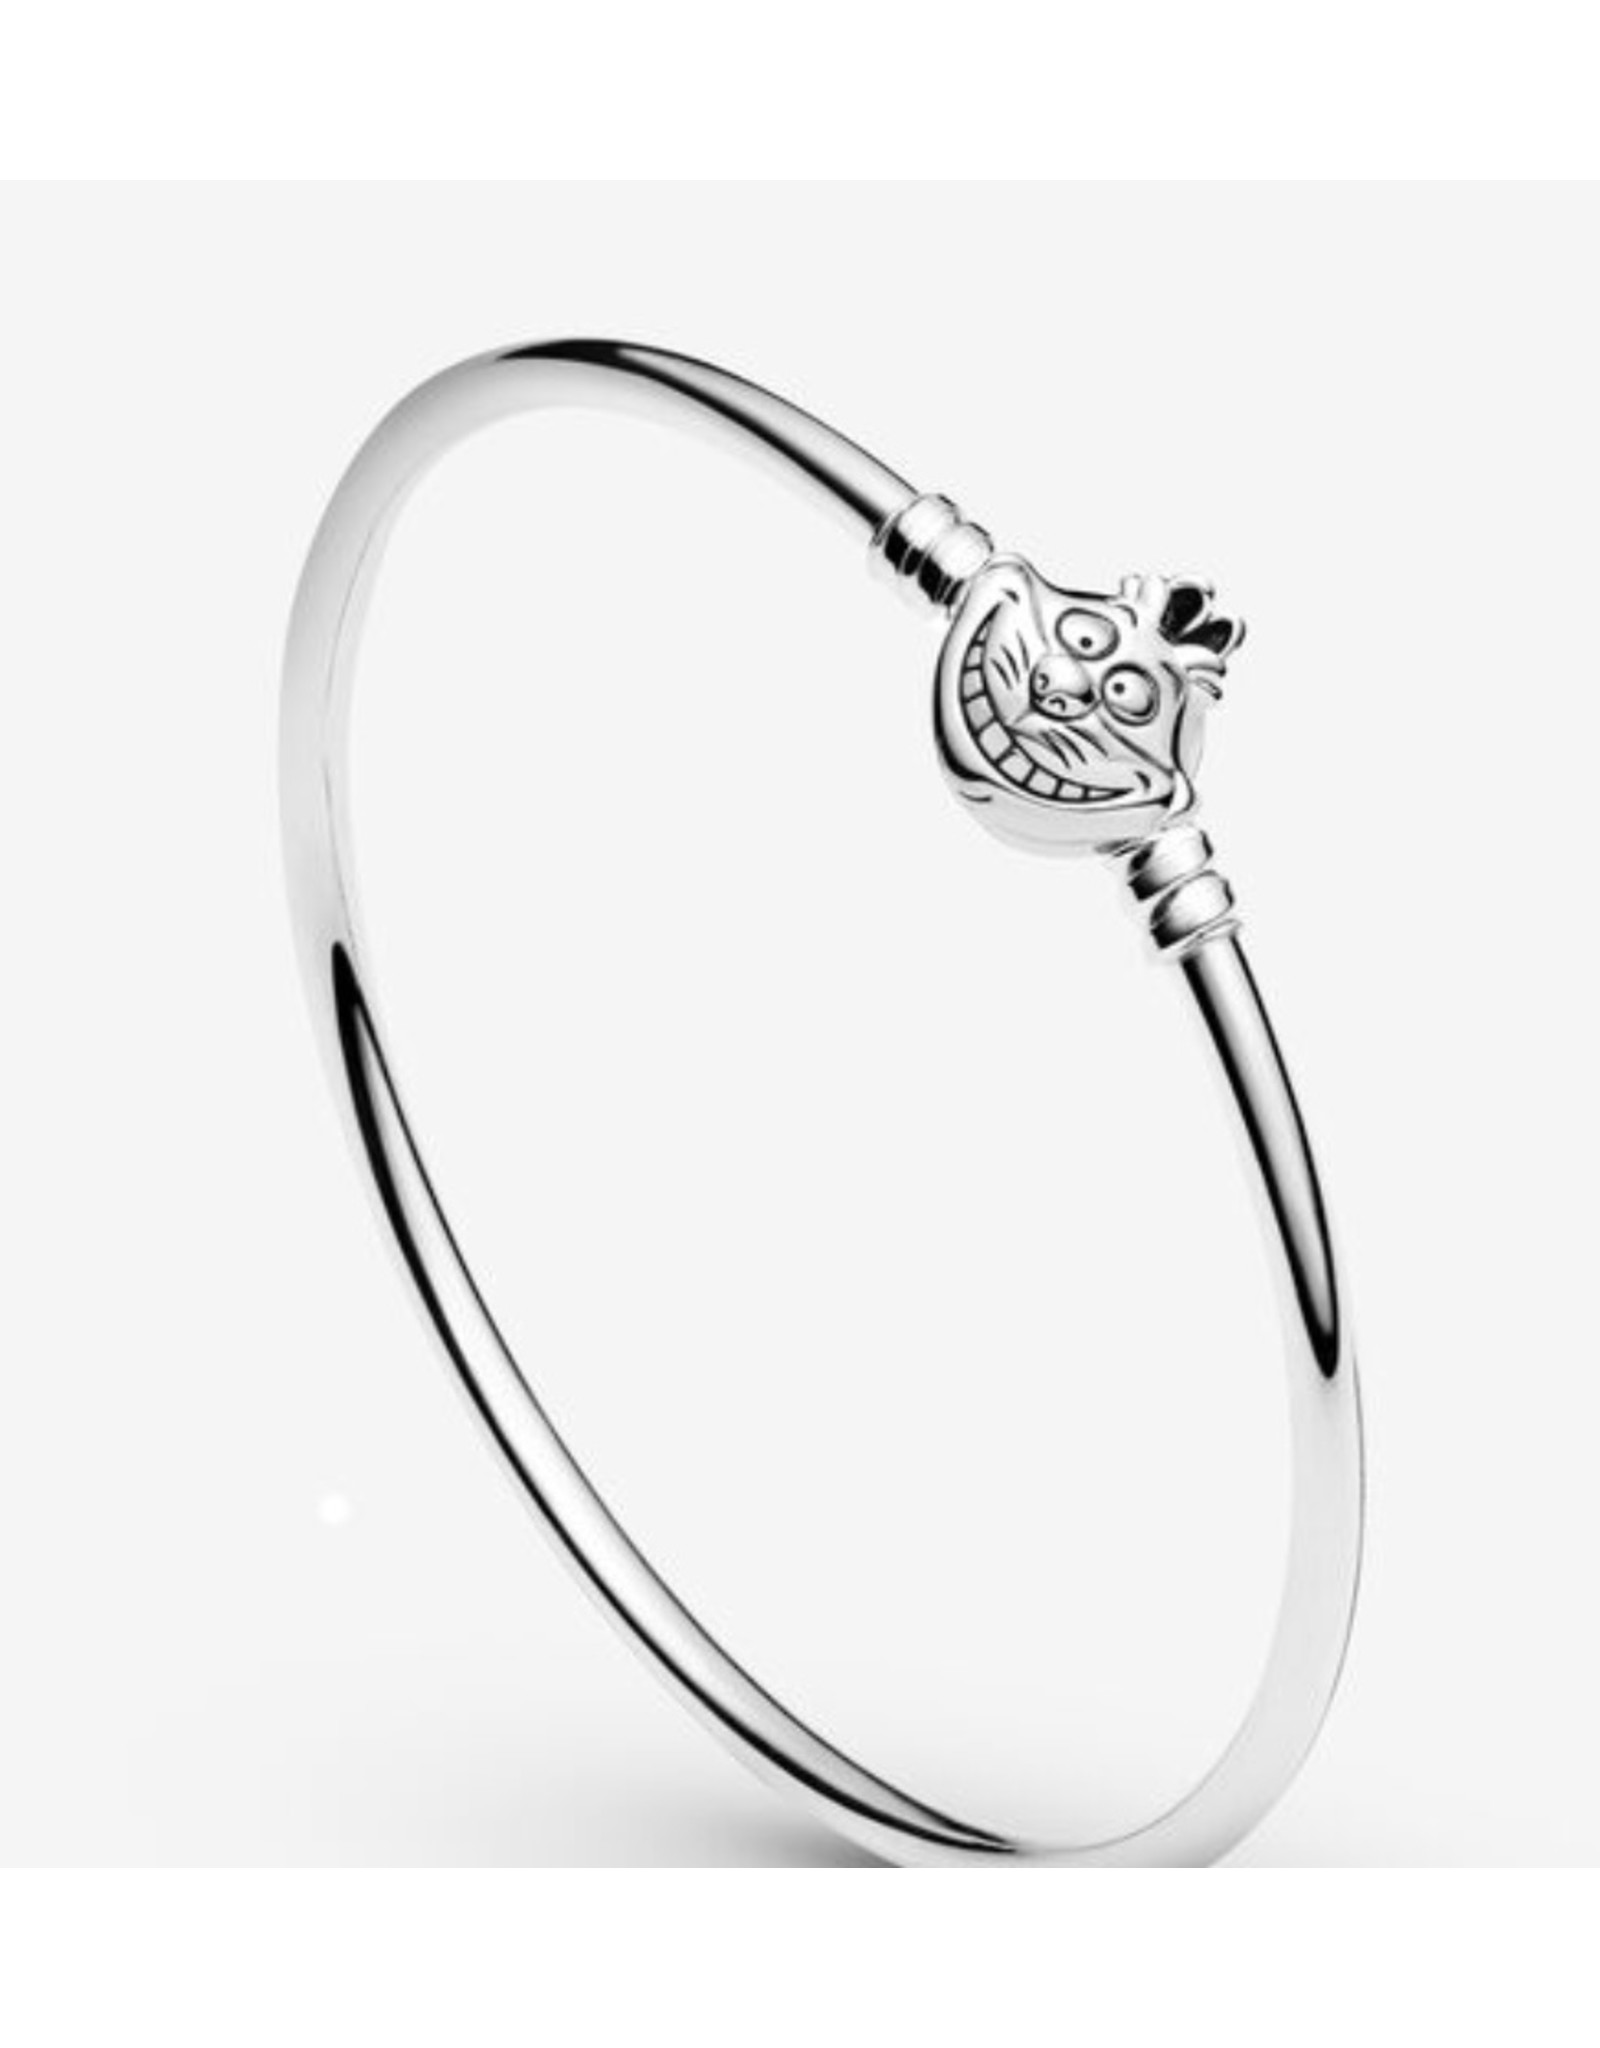 Pandora Pandora Bracelet,599343C00, Disney Alice In Wonderland, Cheshire Cat